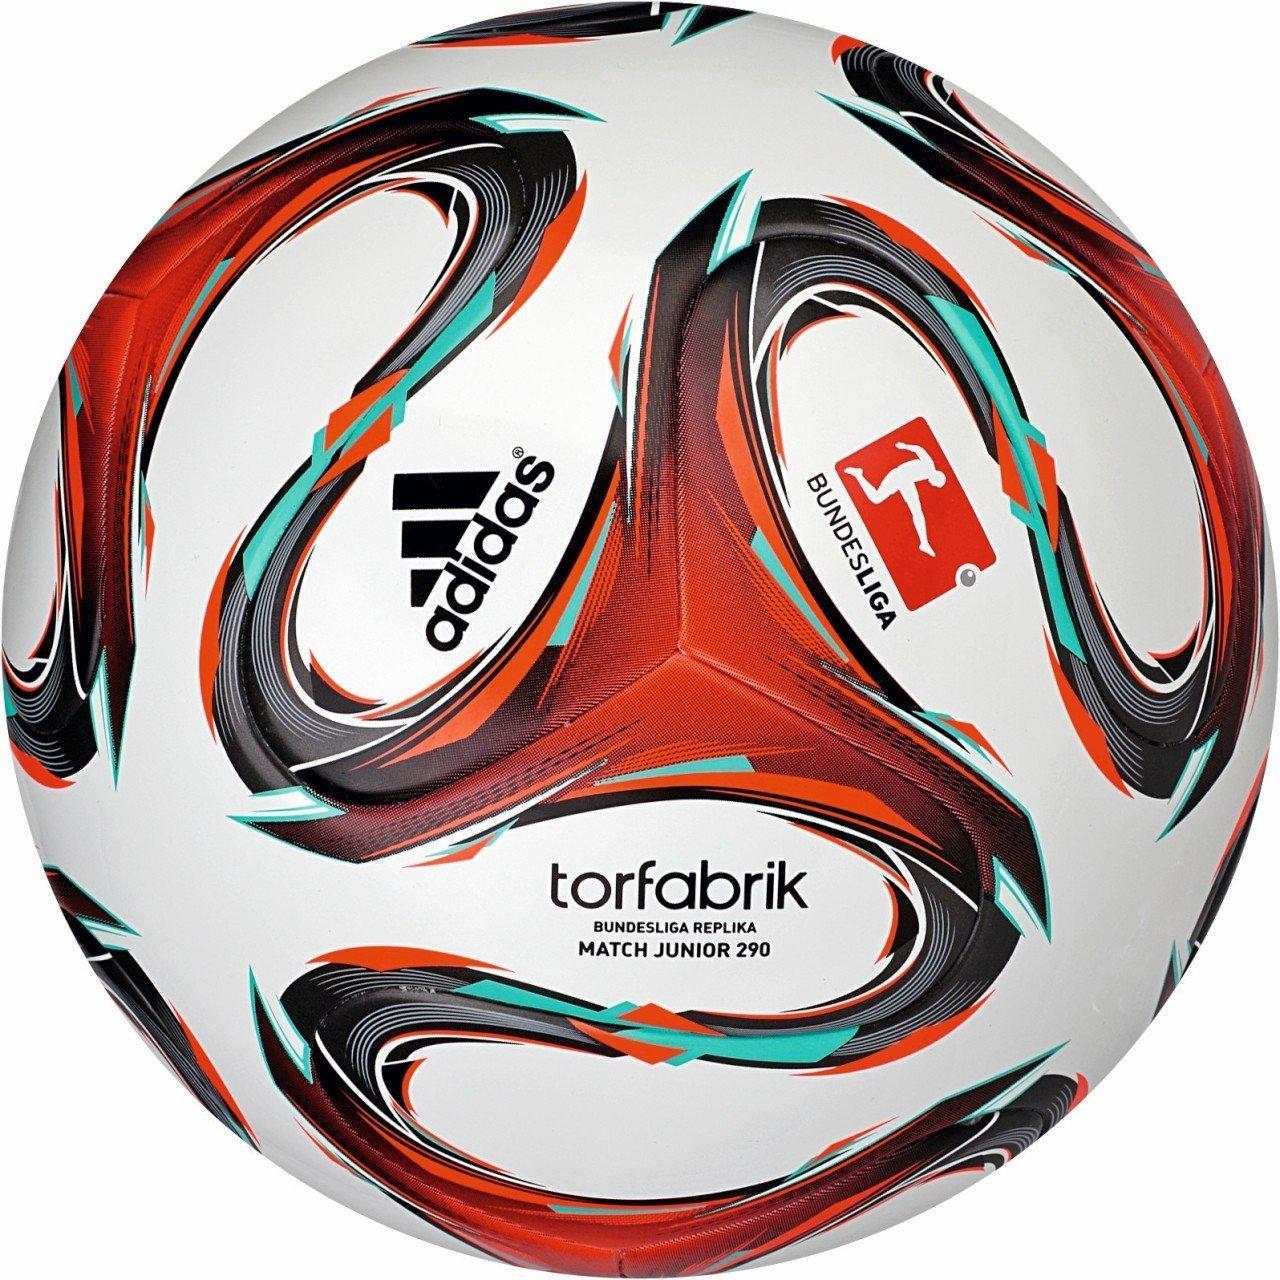 Fussbal Ball Torfabrik Kinder